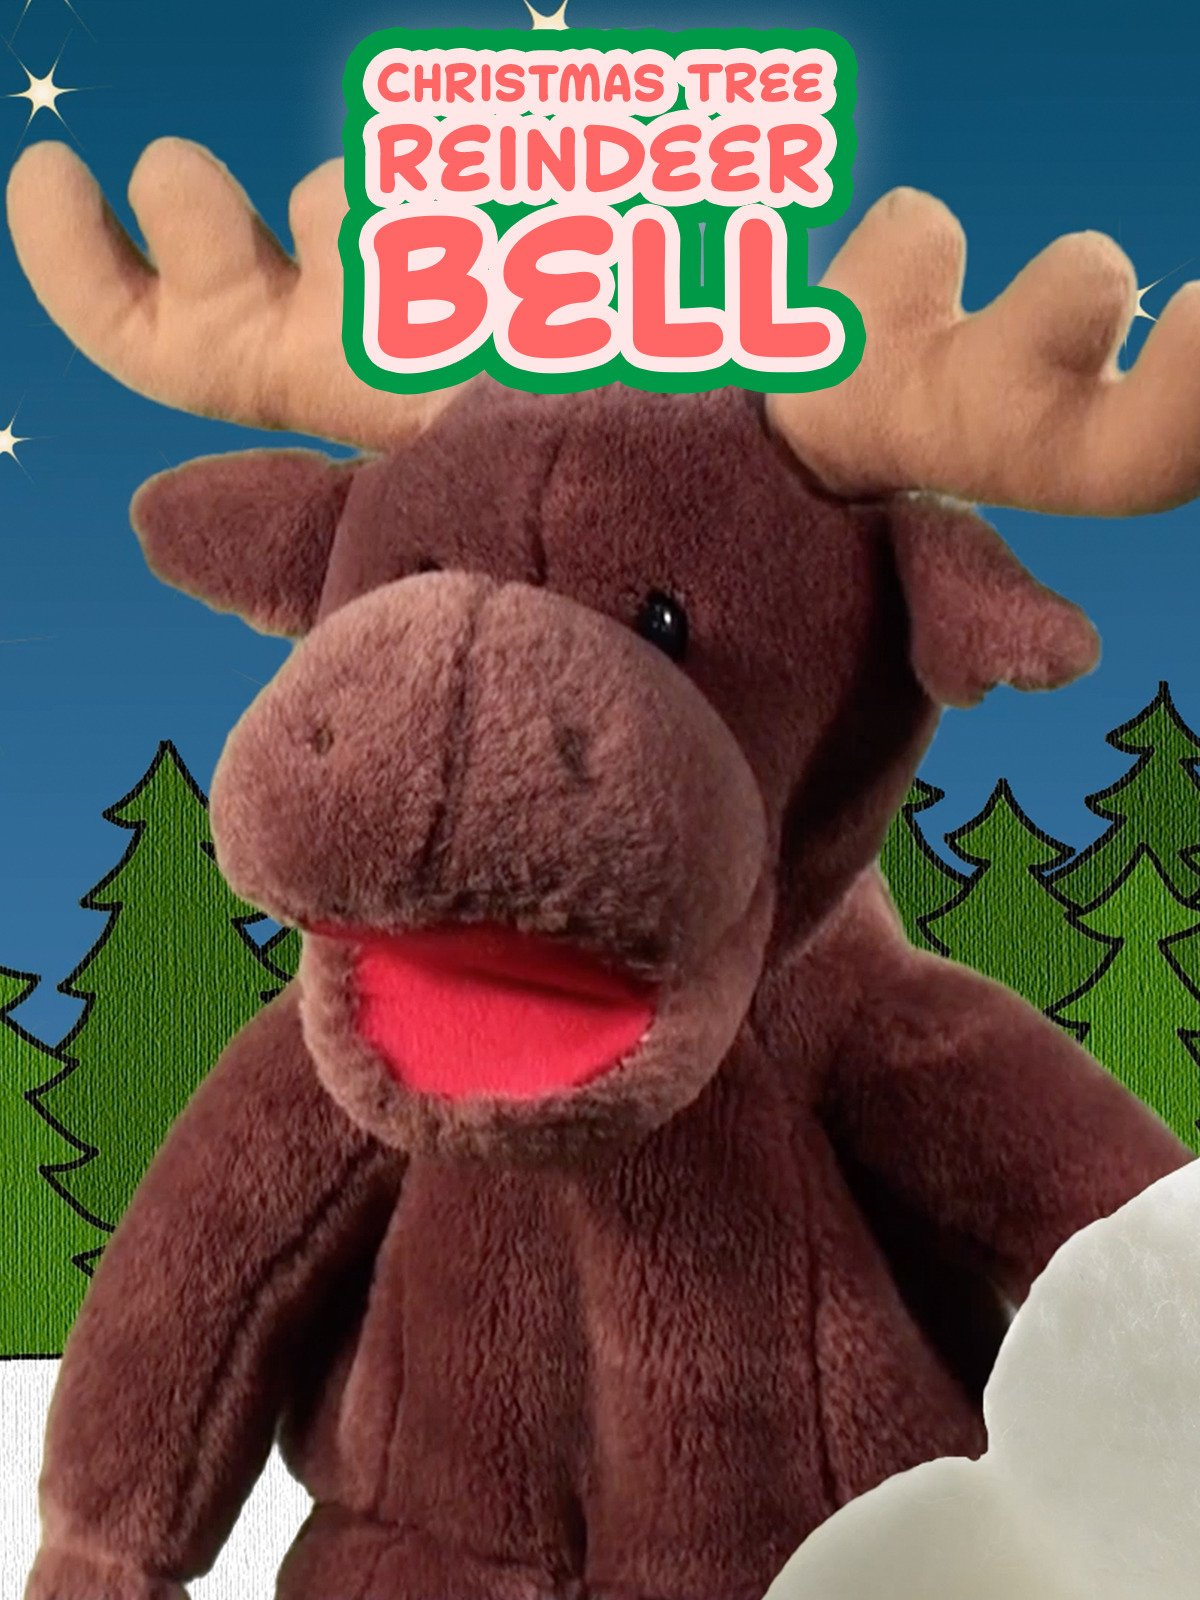 Christmas Tree, Reindeer, Bell on Amazon Prime Video UK